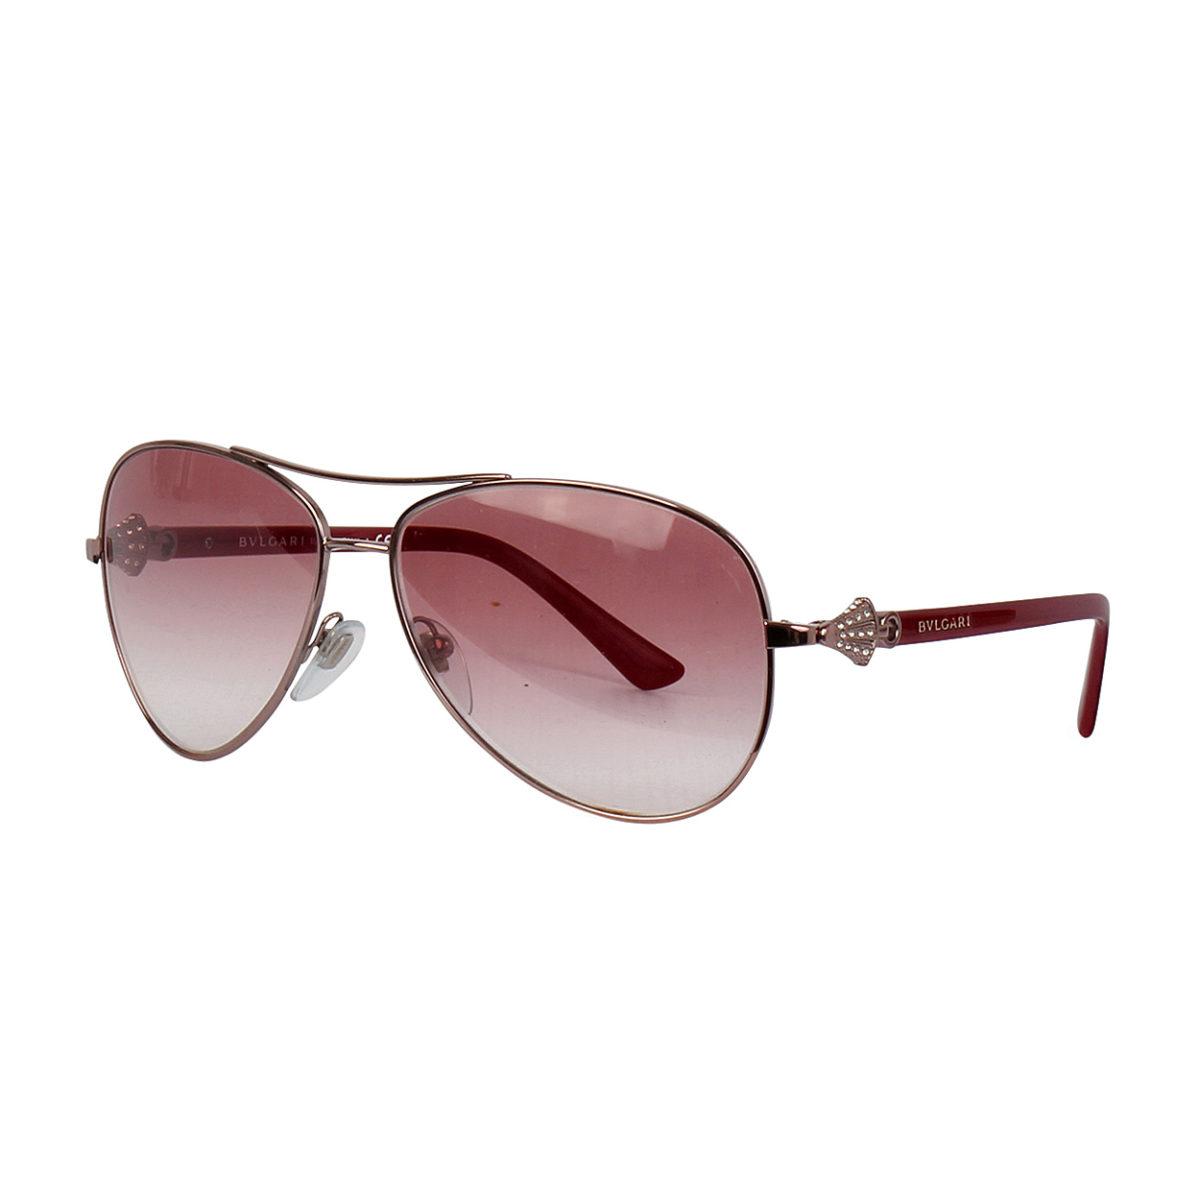 98a7837235a BVLGARI Sunglasses 6073B Violet